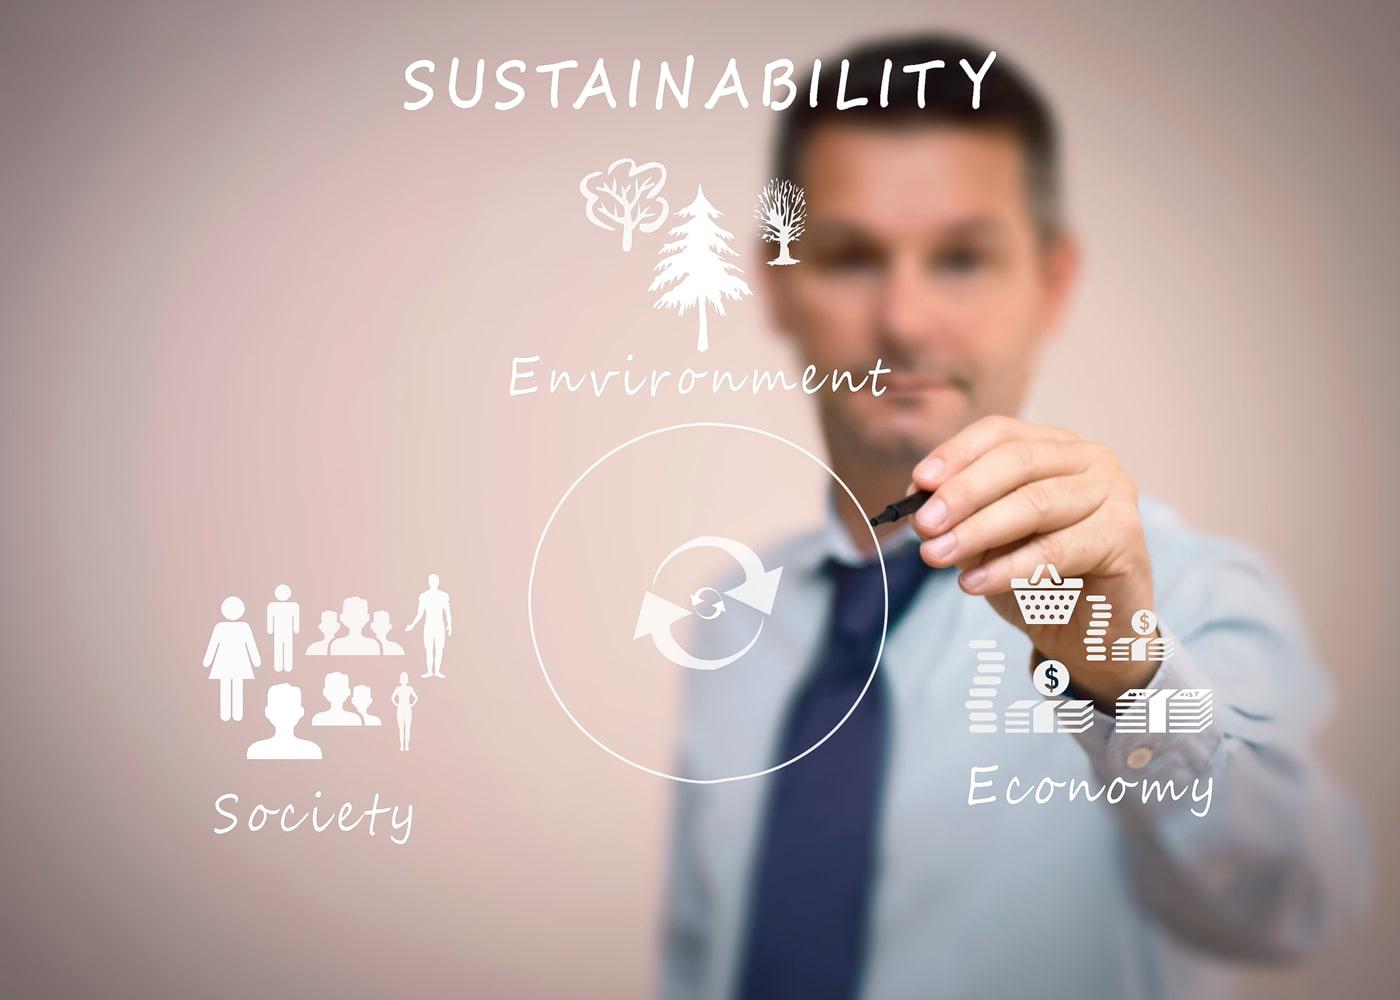 naem-2018-blog-business-man-writing-sustainability-concept-700x500